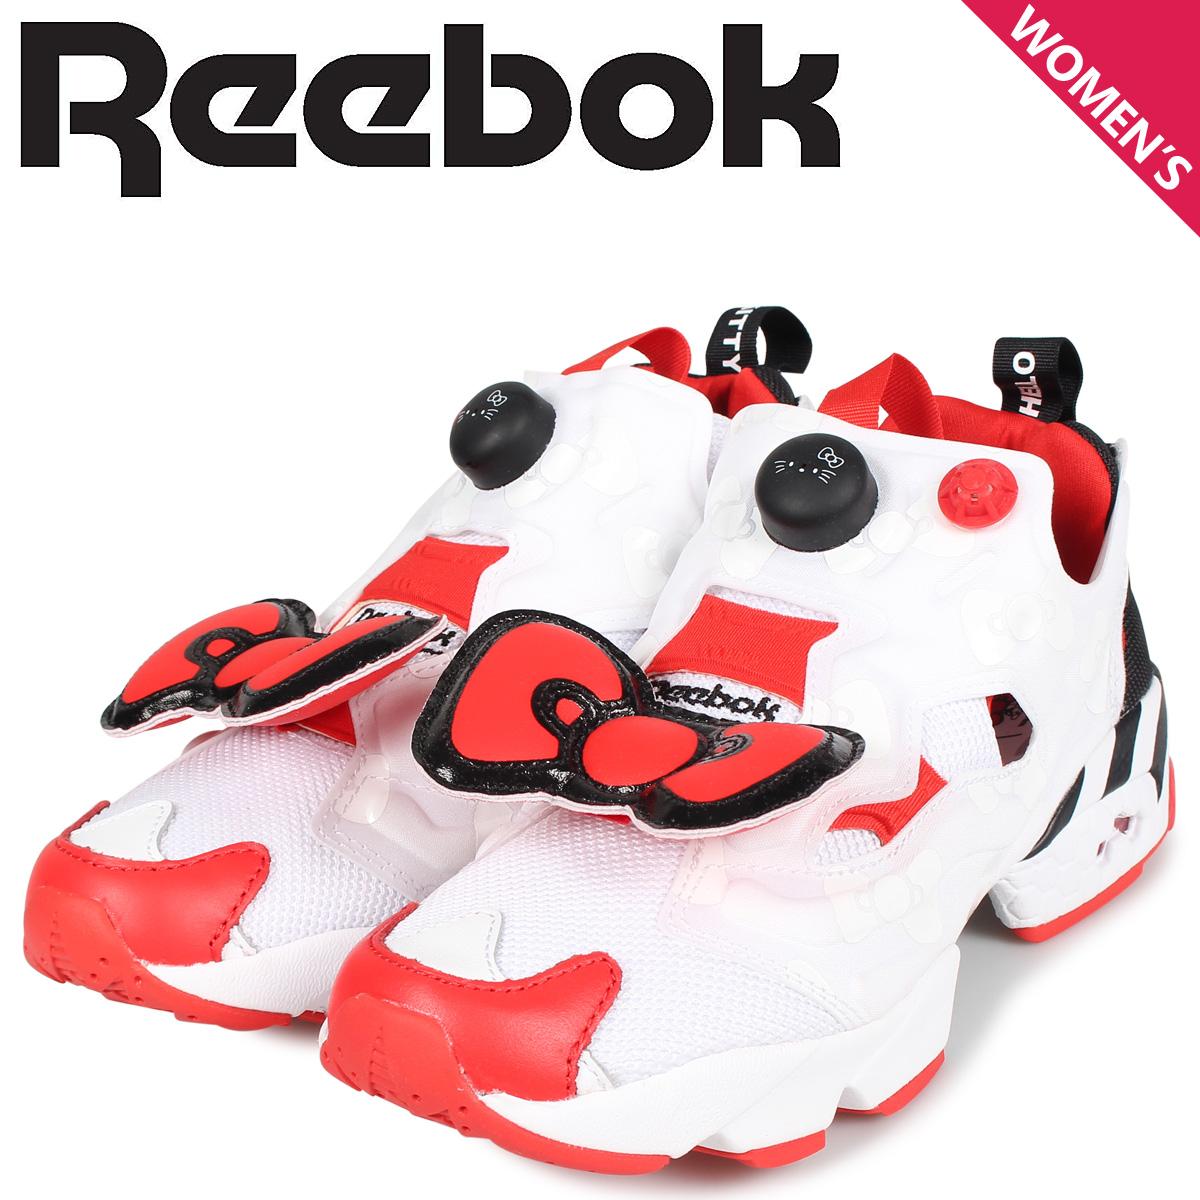 Reebok リーボック インスタ ポンプフューリー スニーカー レディース INSTAPUMP FURY OG ホワイト 白 EH2798